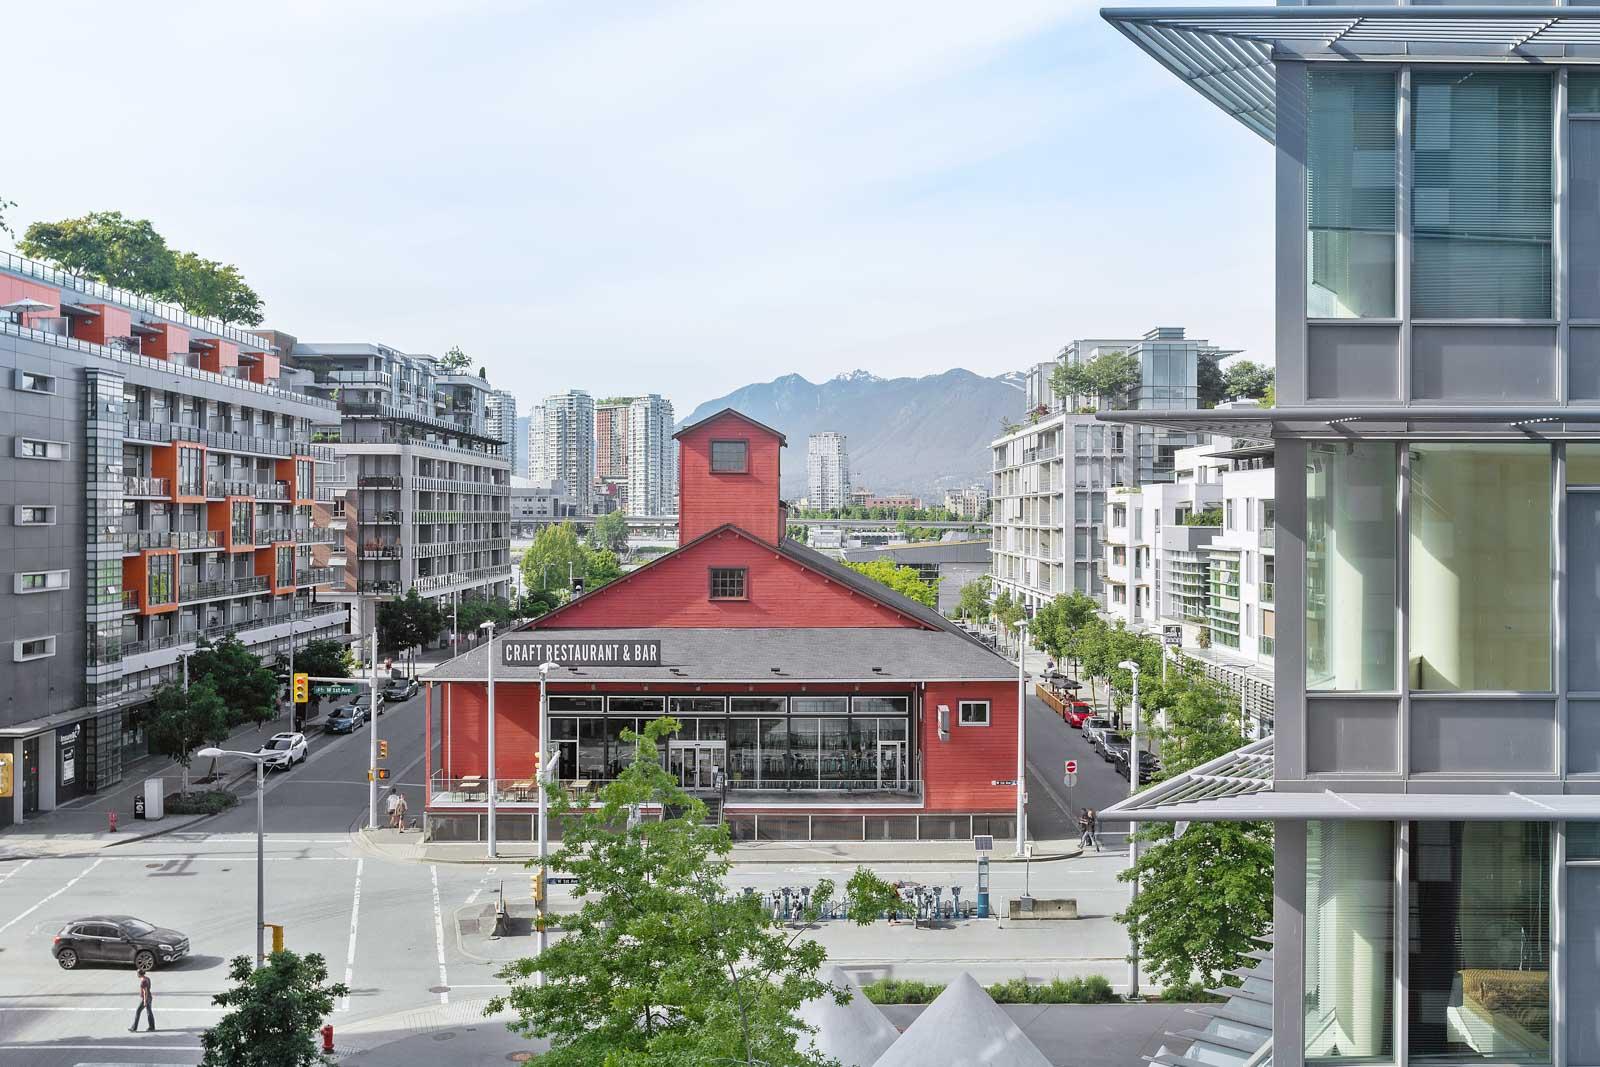 plenty of restaurants and amenities nearby like craft beer market